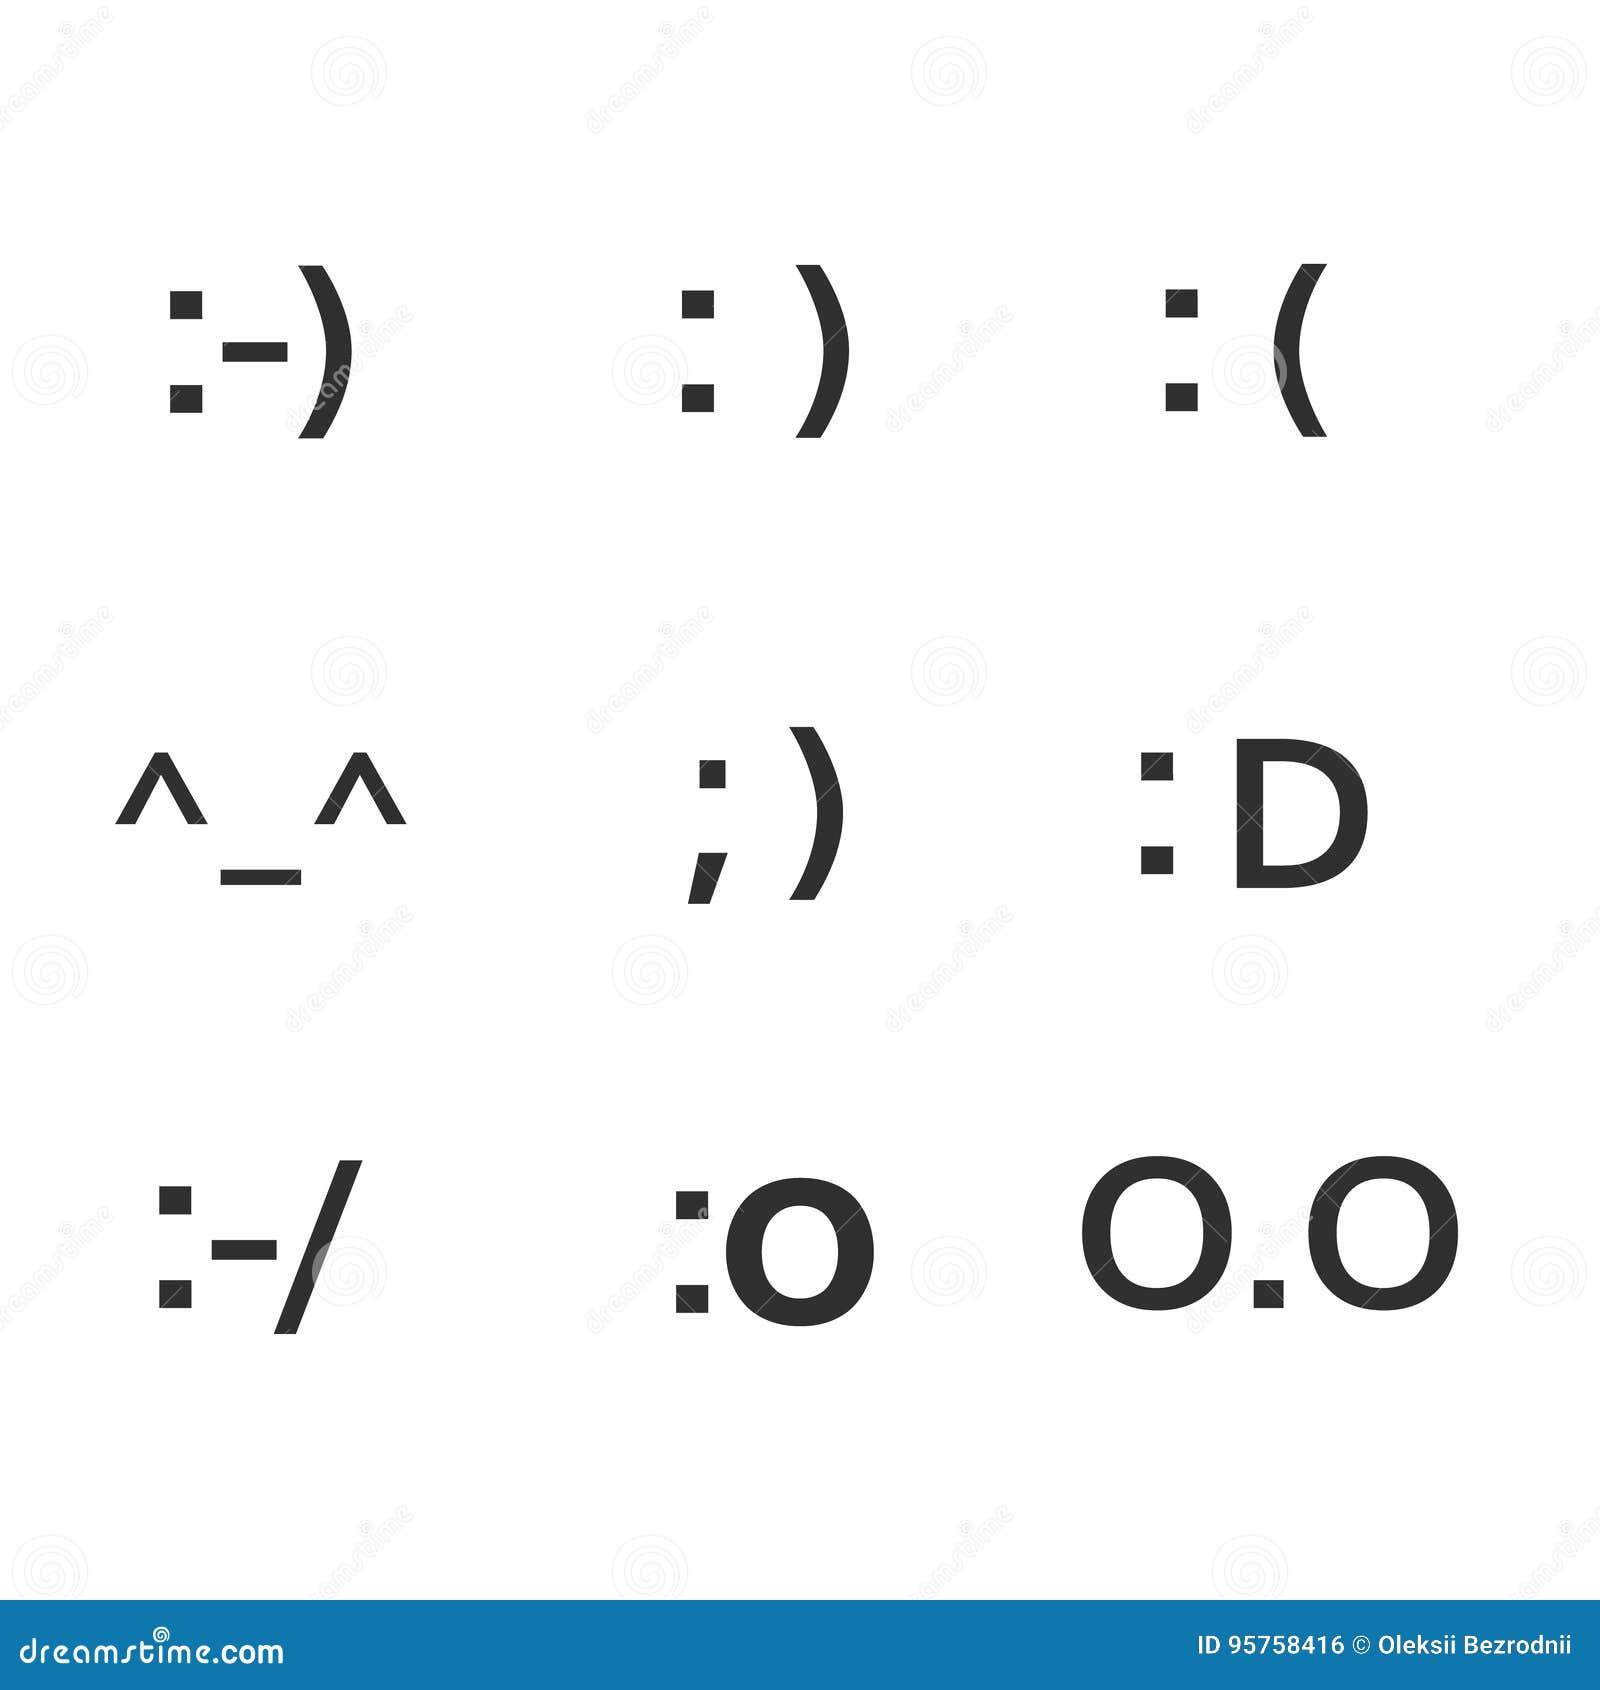 Emoji faces keyboard symbols smile symbols stock vector emoji faces keyboard symbols smile symbols biocorpaavc